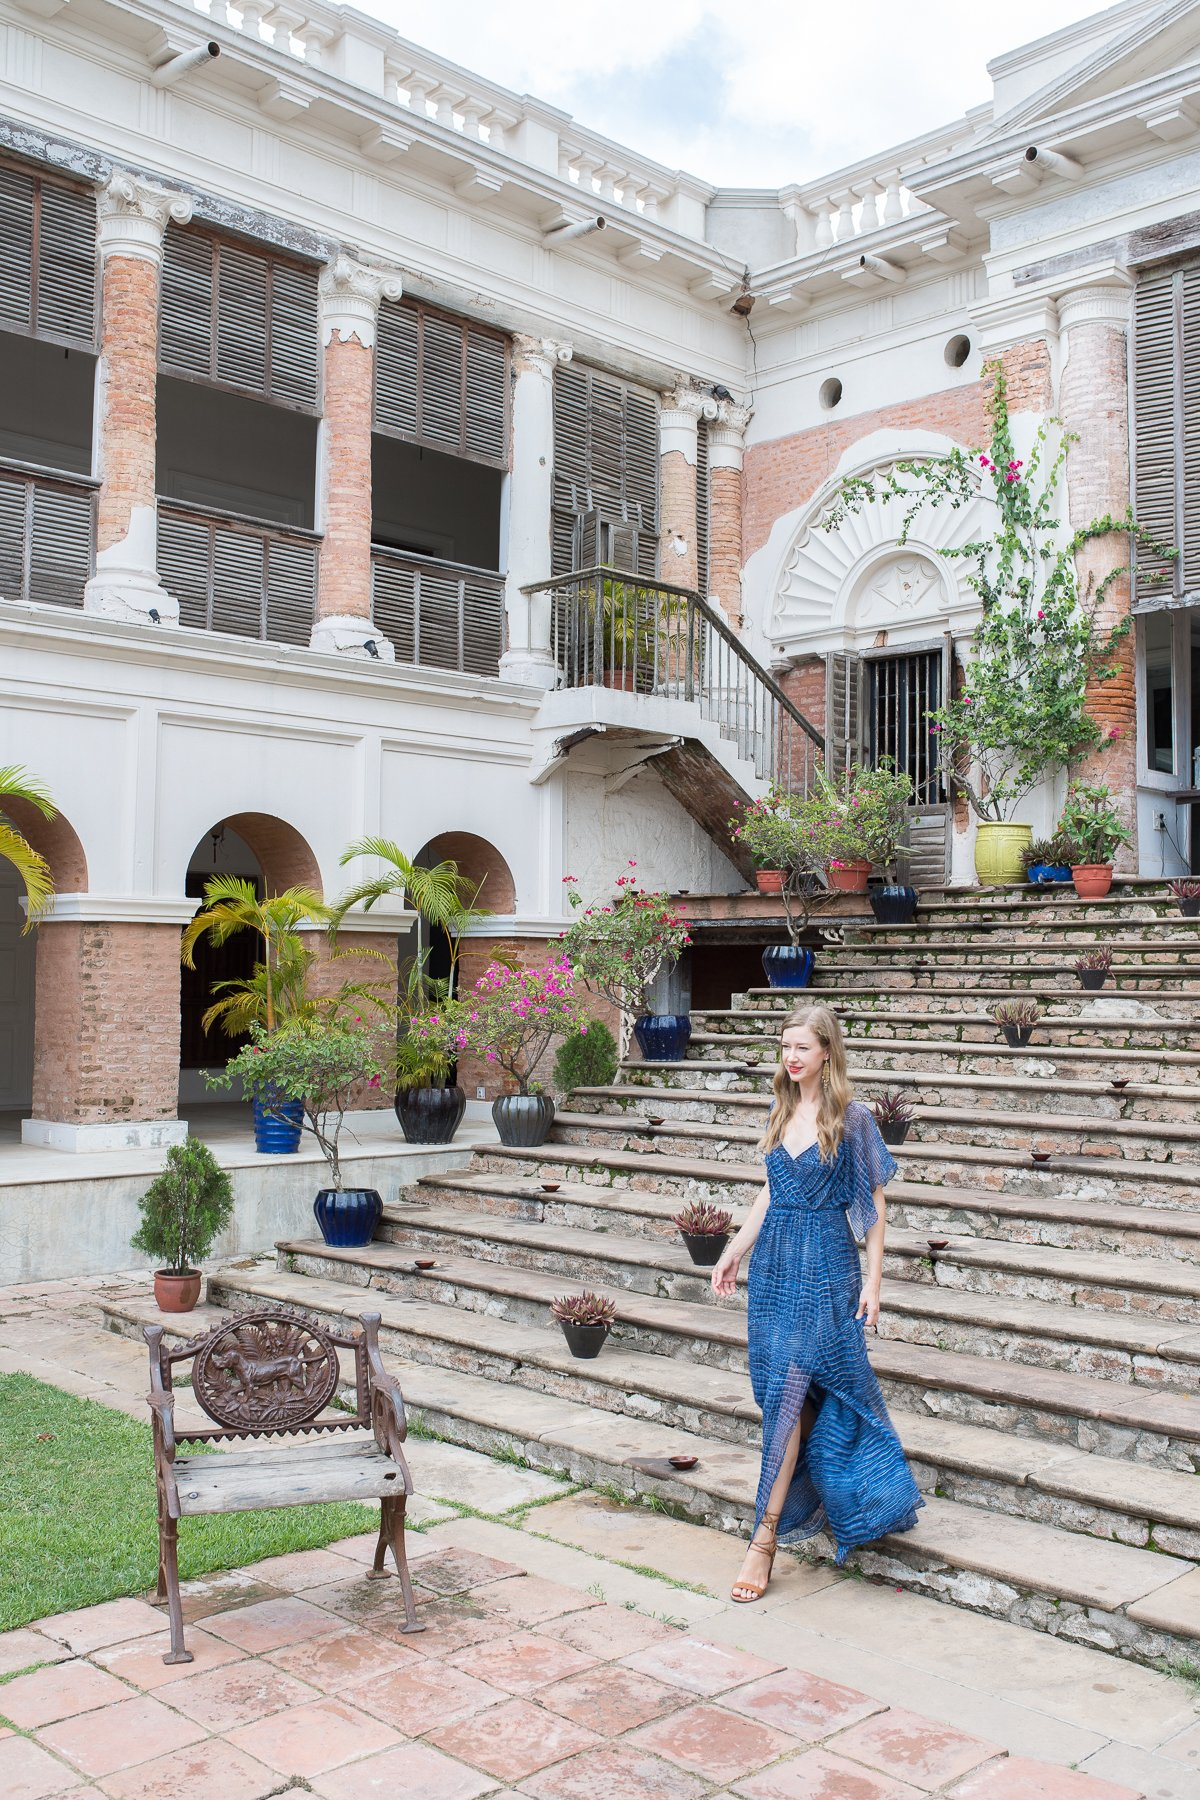 Stacie Flinner The Rajbari Bawali Heritage Hotel Calcutta-48.jpg